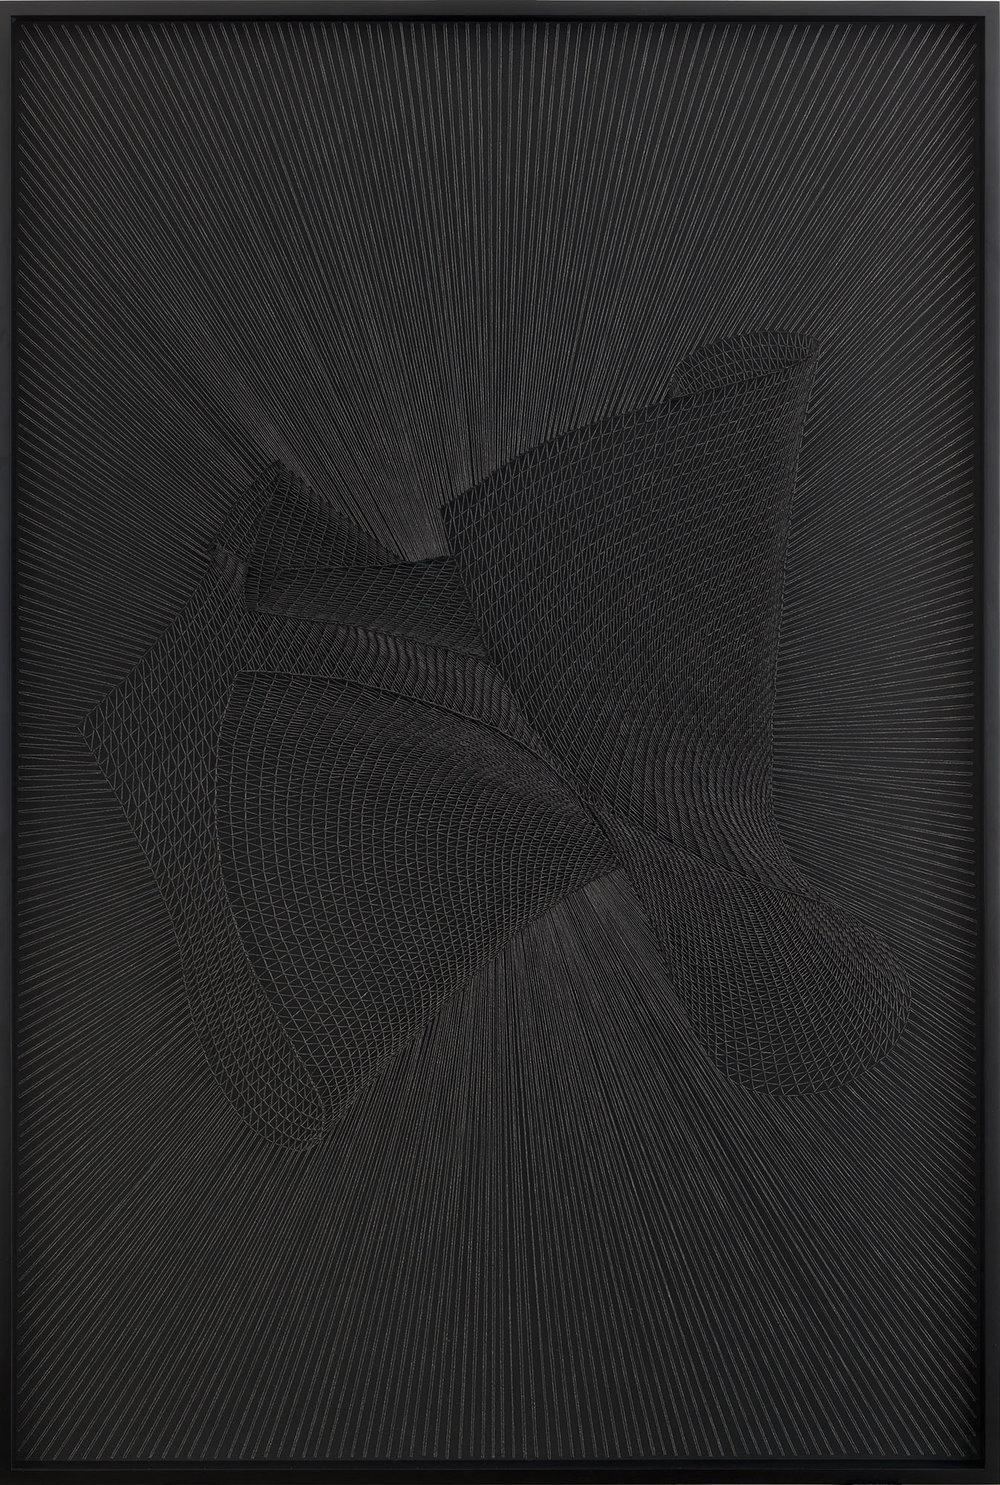 Gravity Fold, 2017